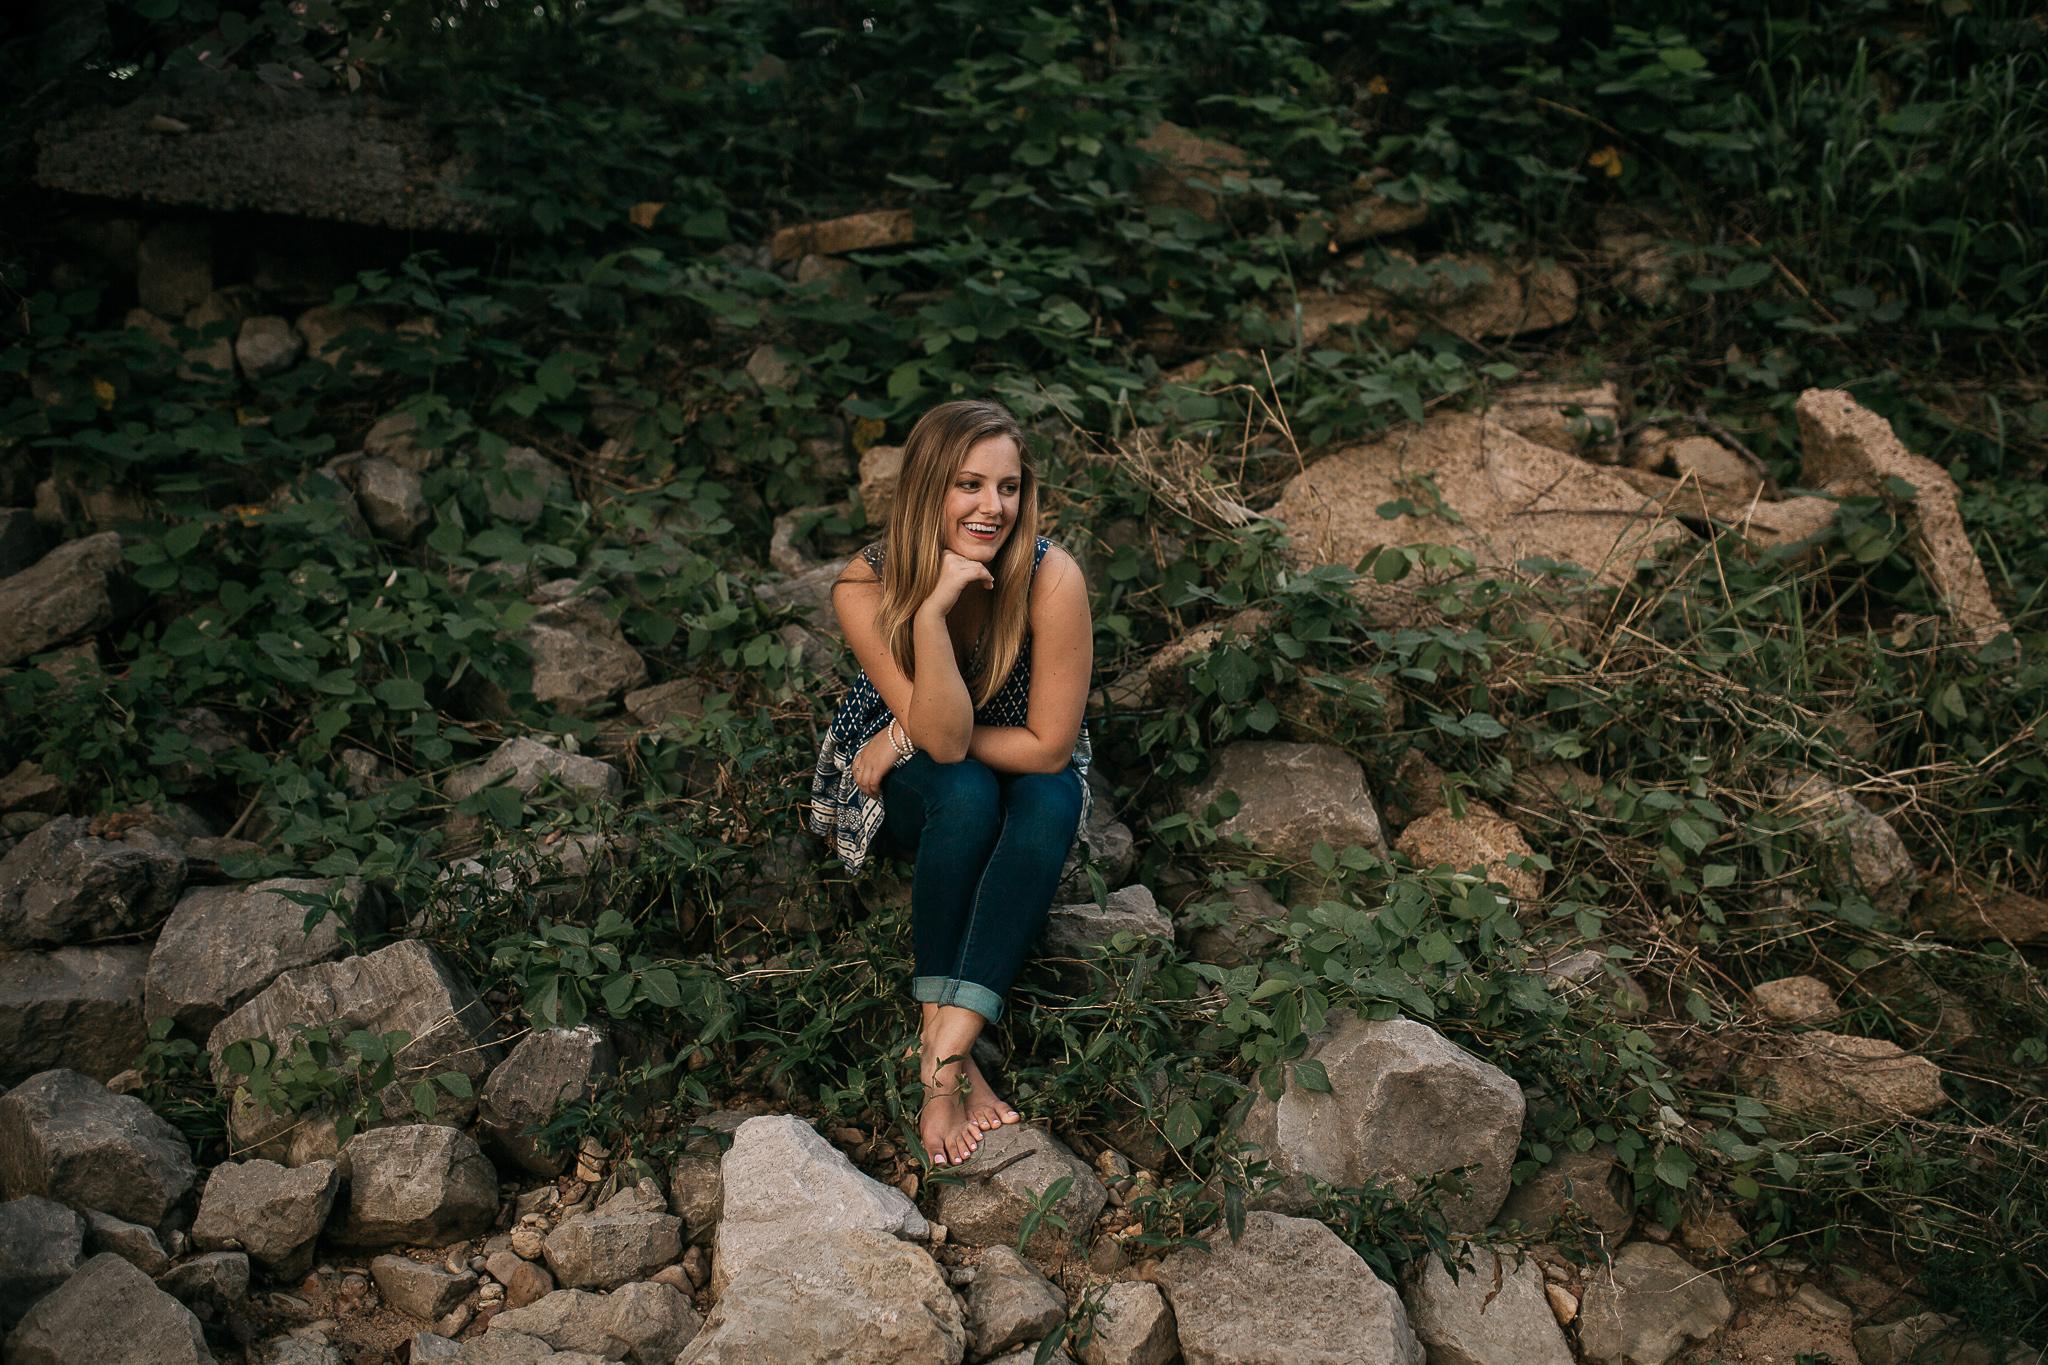 hernando-senior-photographer-hernando-high-school-senior-pictures-outdoors